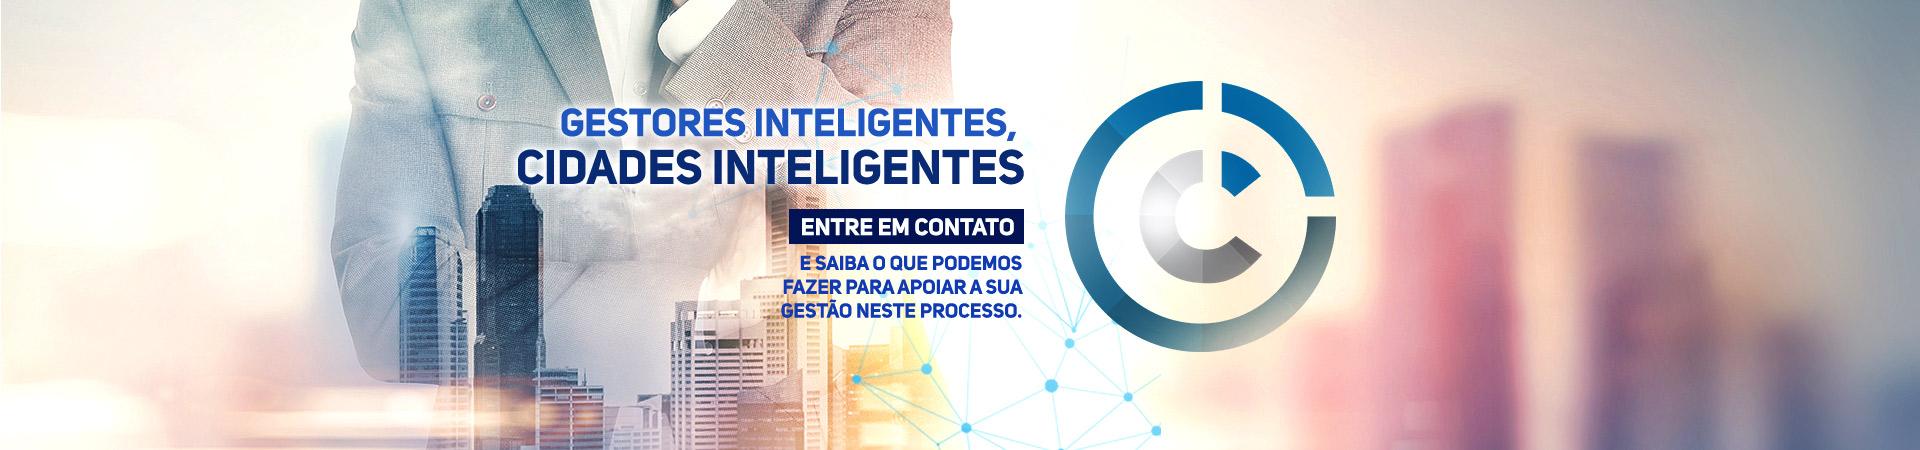 Banner_cidades-inteligentes2